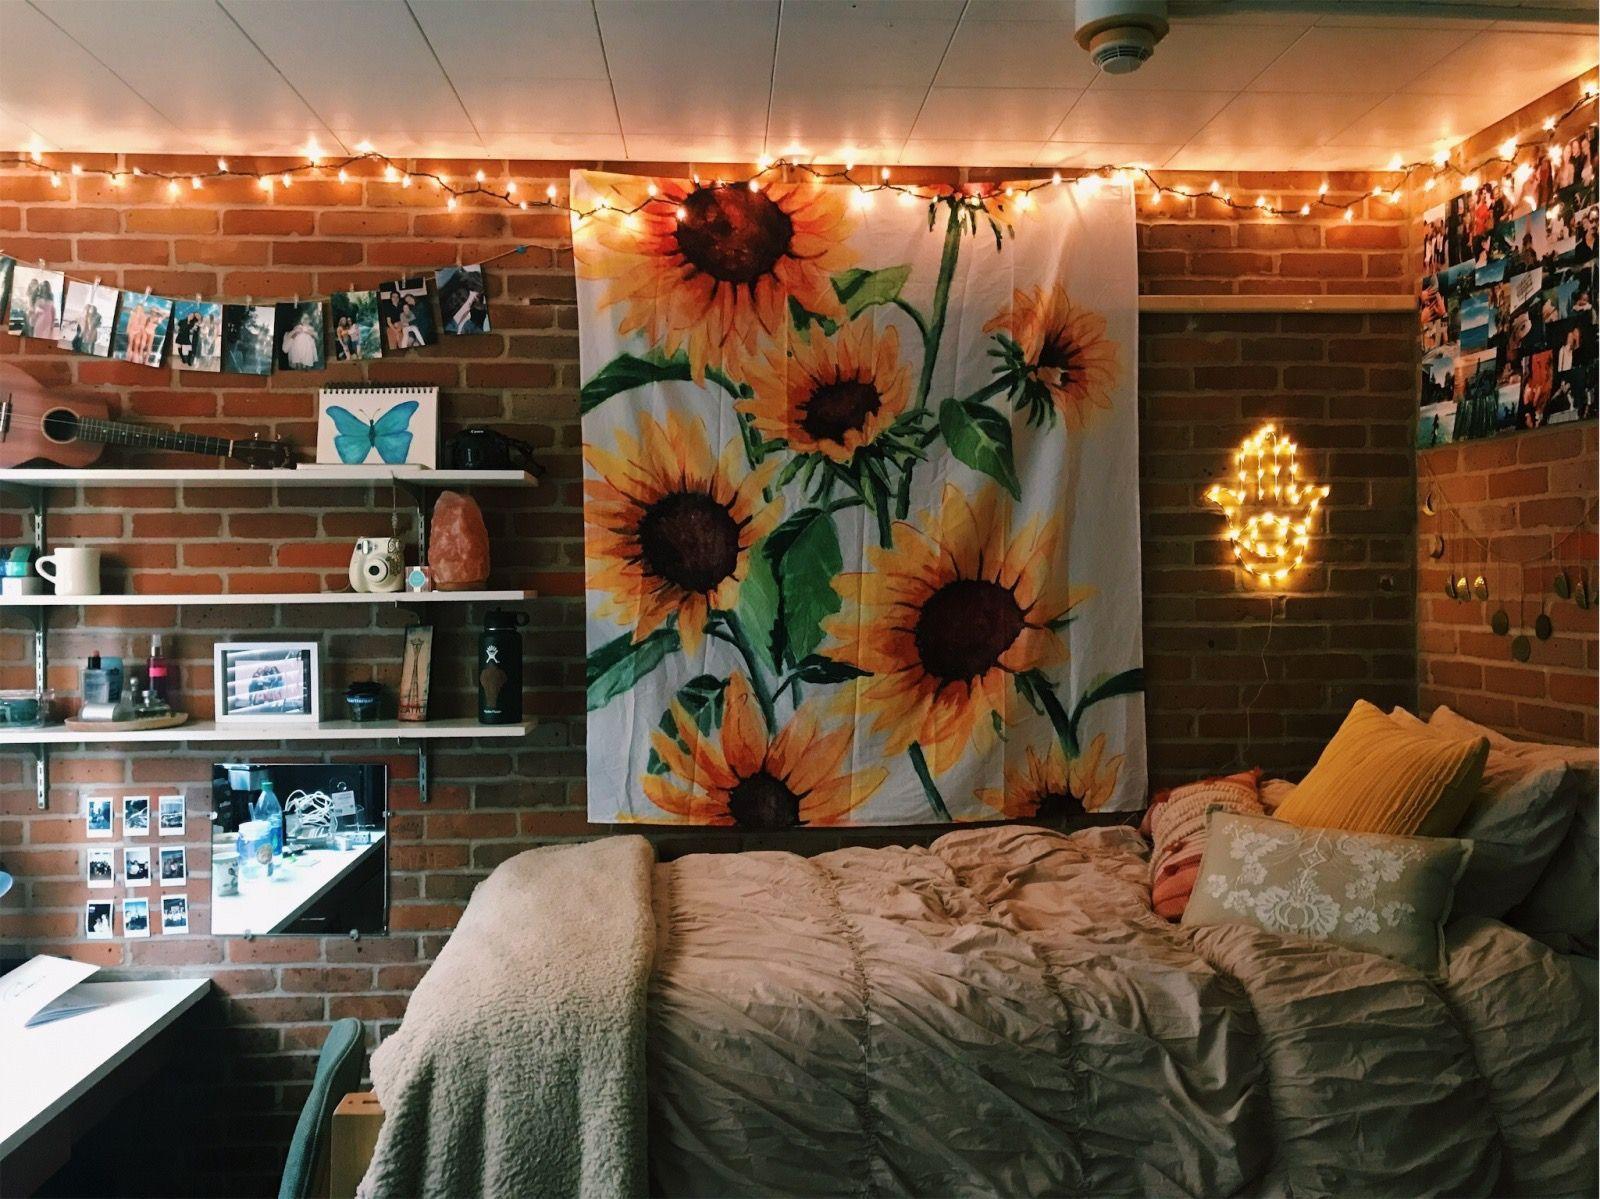 Dorm sweet dorm | Aesthetic bedroom, Room decor